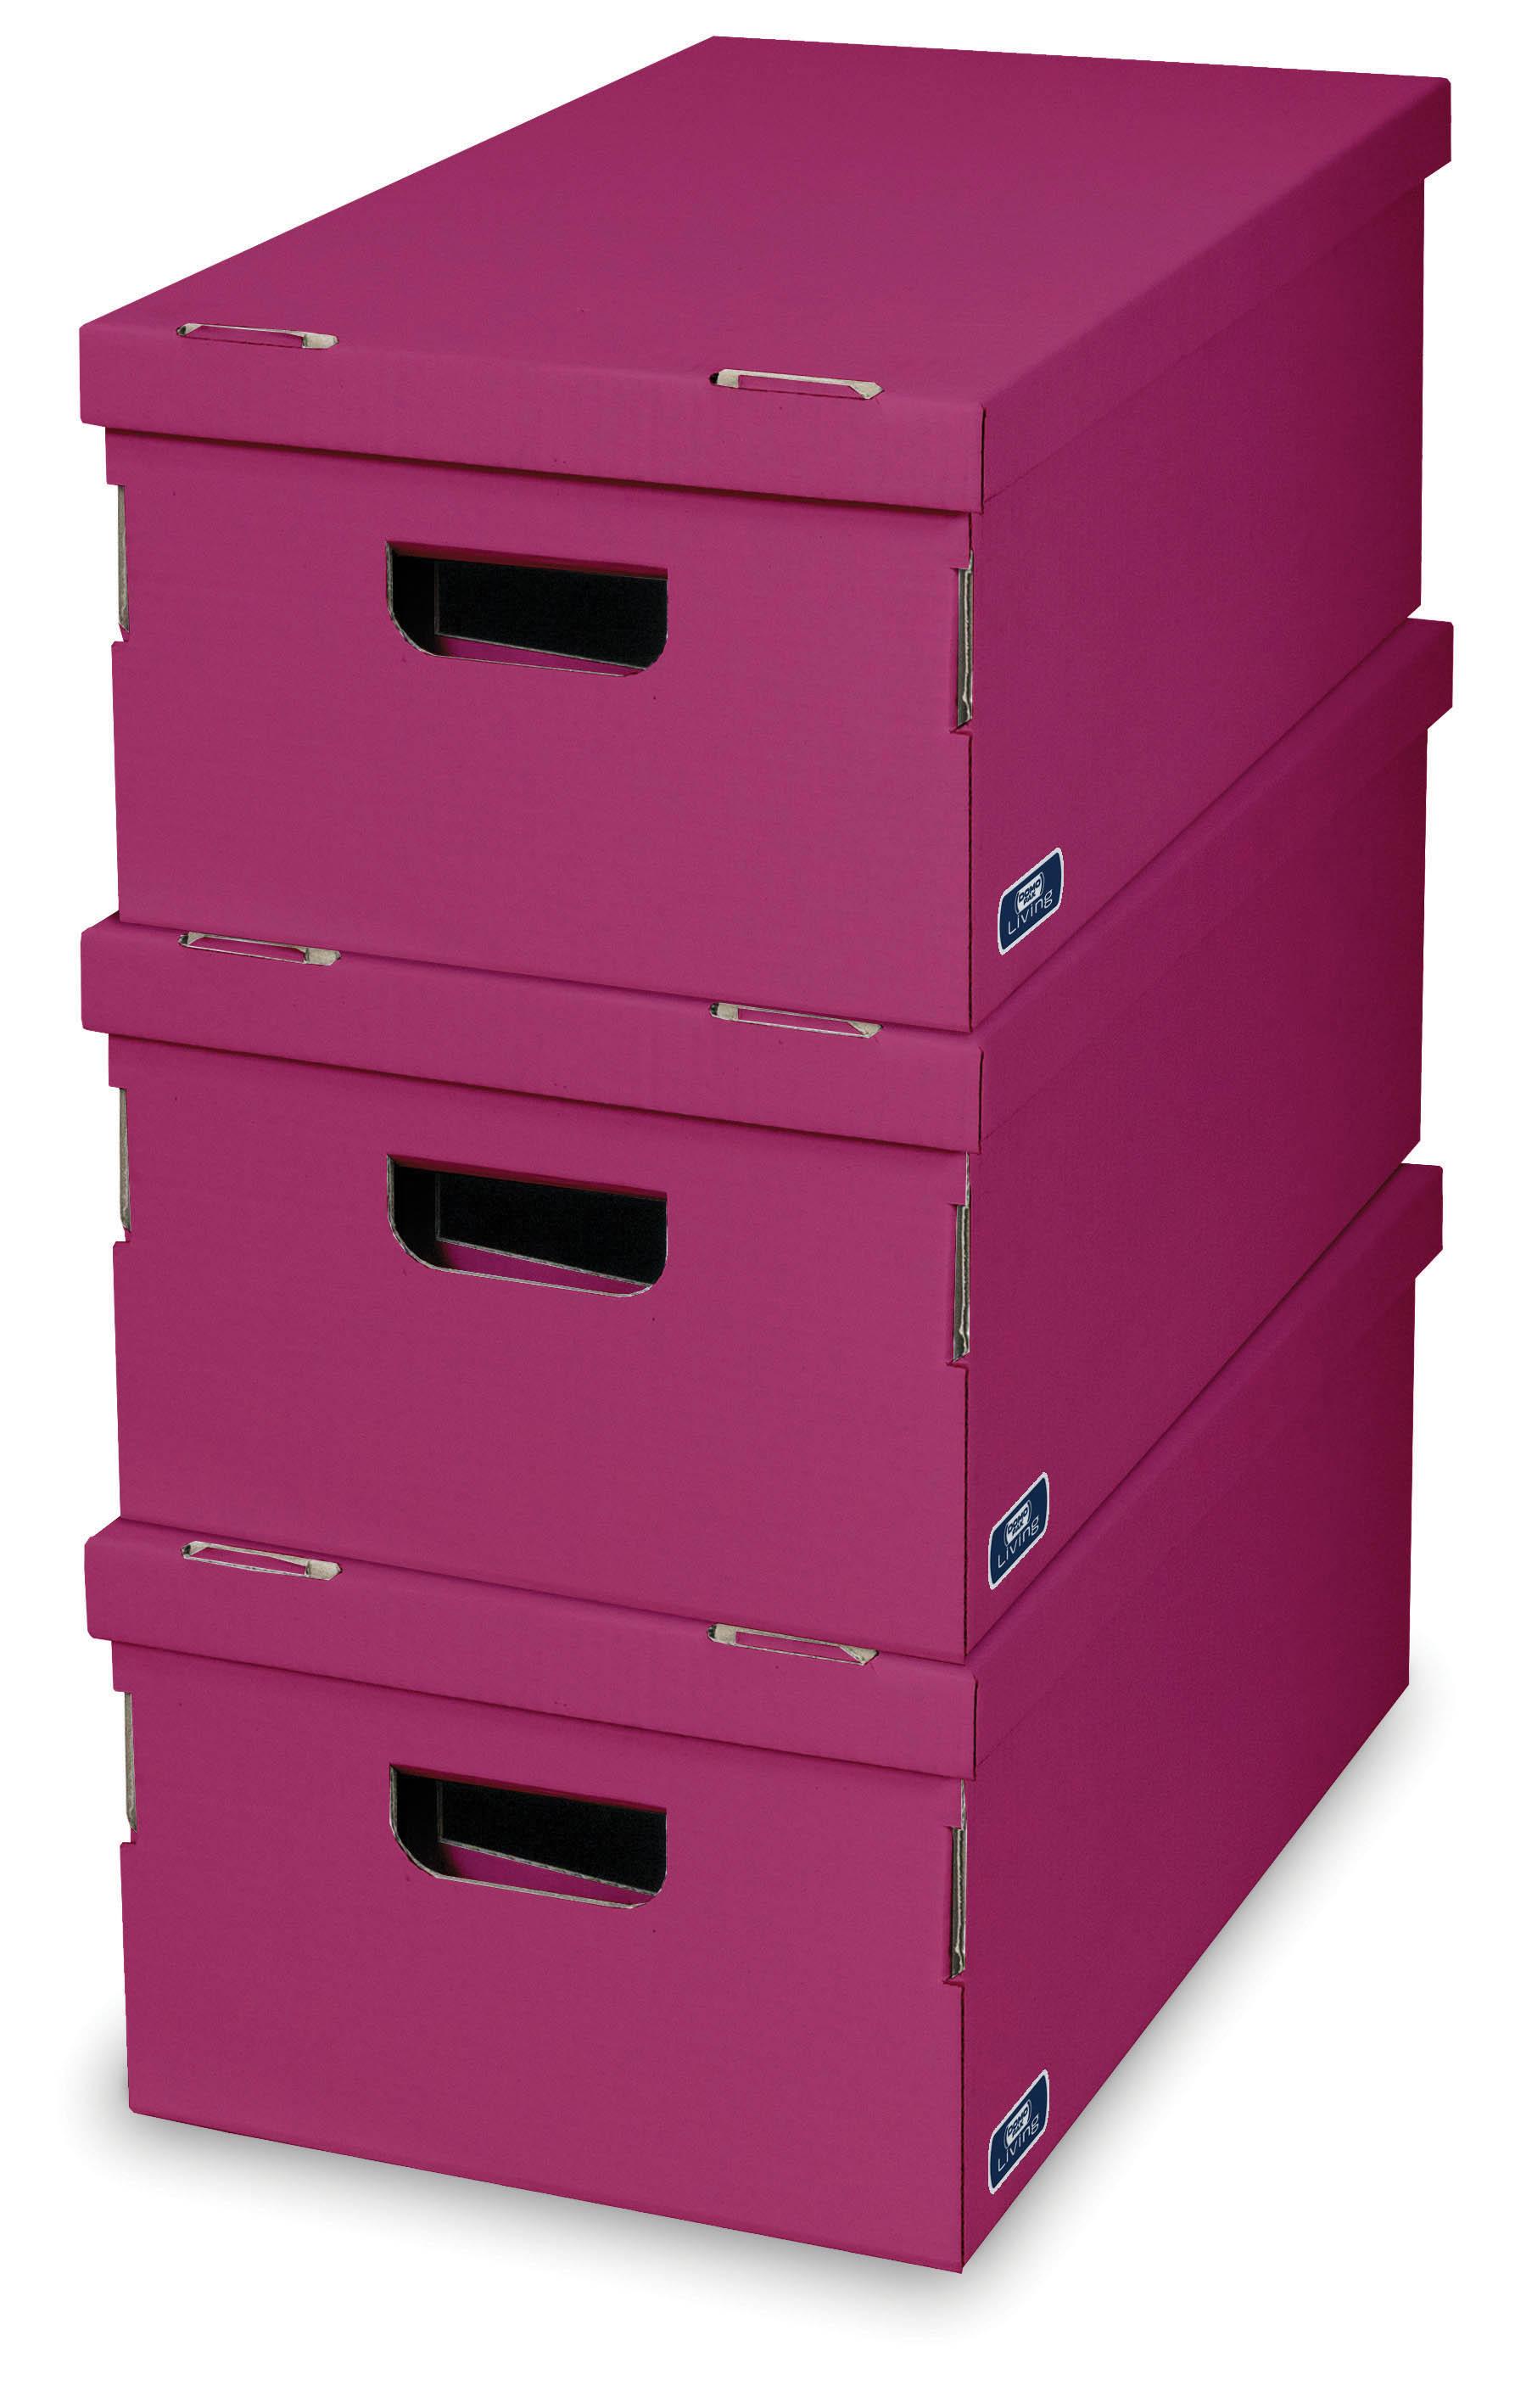 DOMOPAK Living Úložné boxy set 3ks Barva: růžová